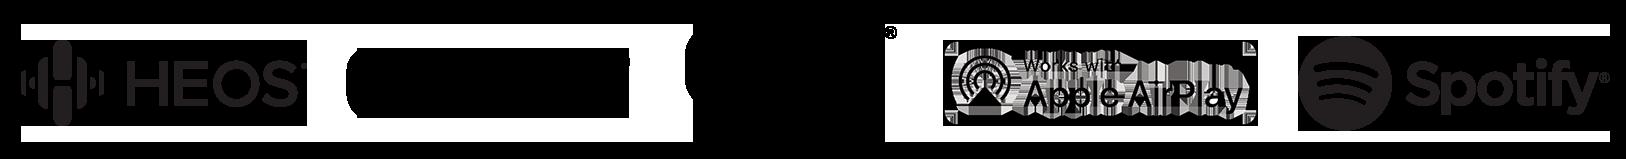 Marantz M-CR612 (New) MZ_Melody_connectivity_tab_logos